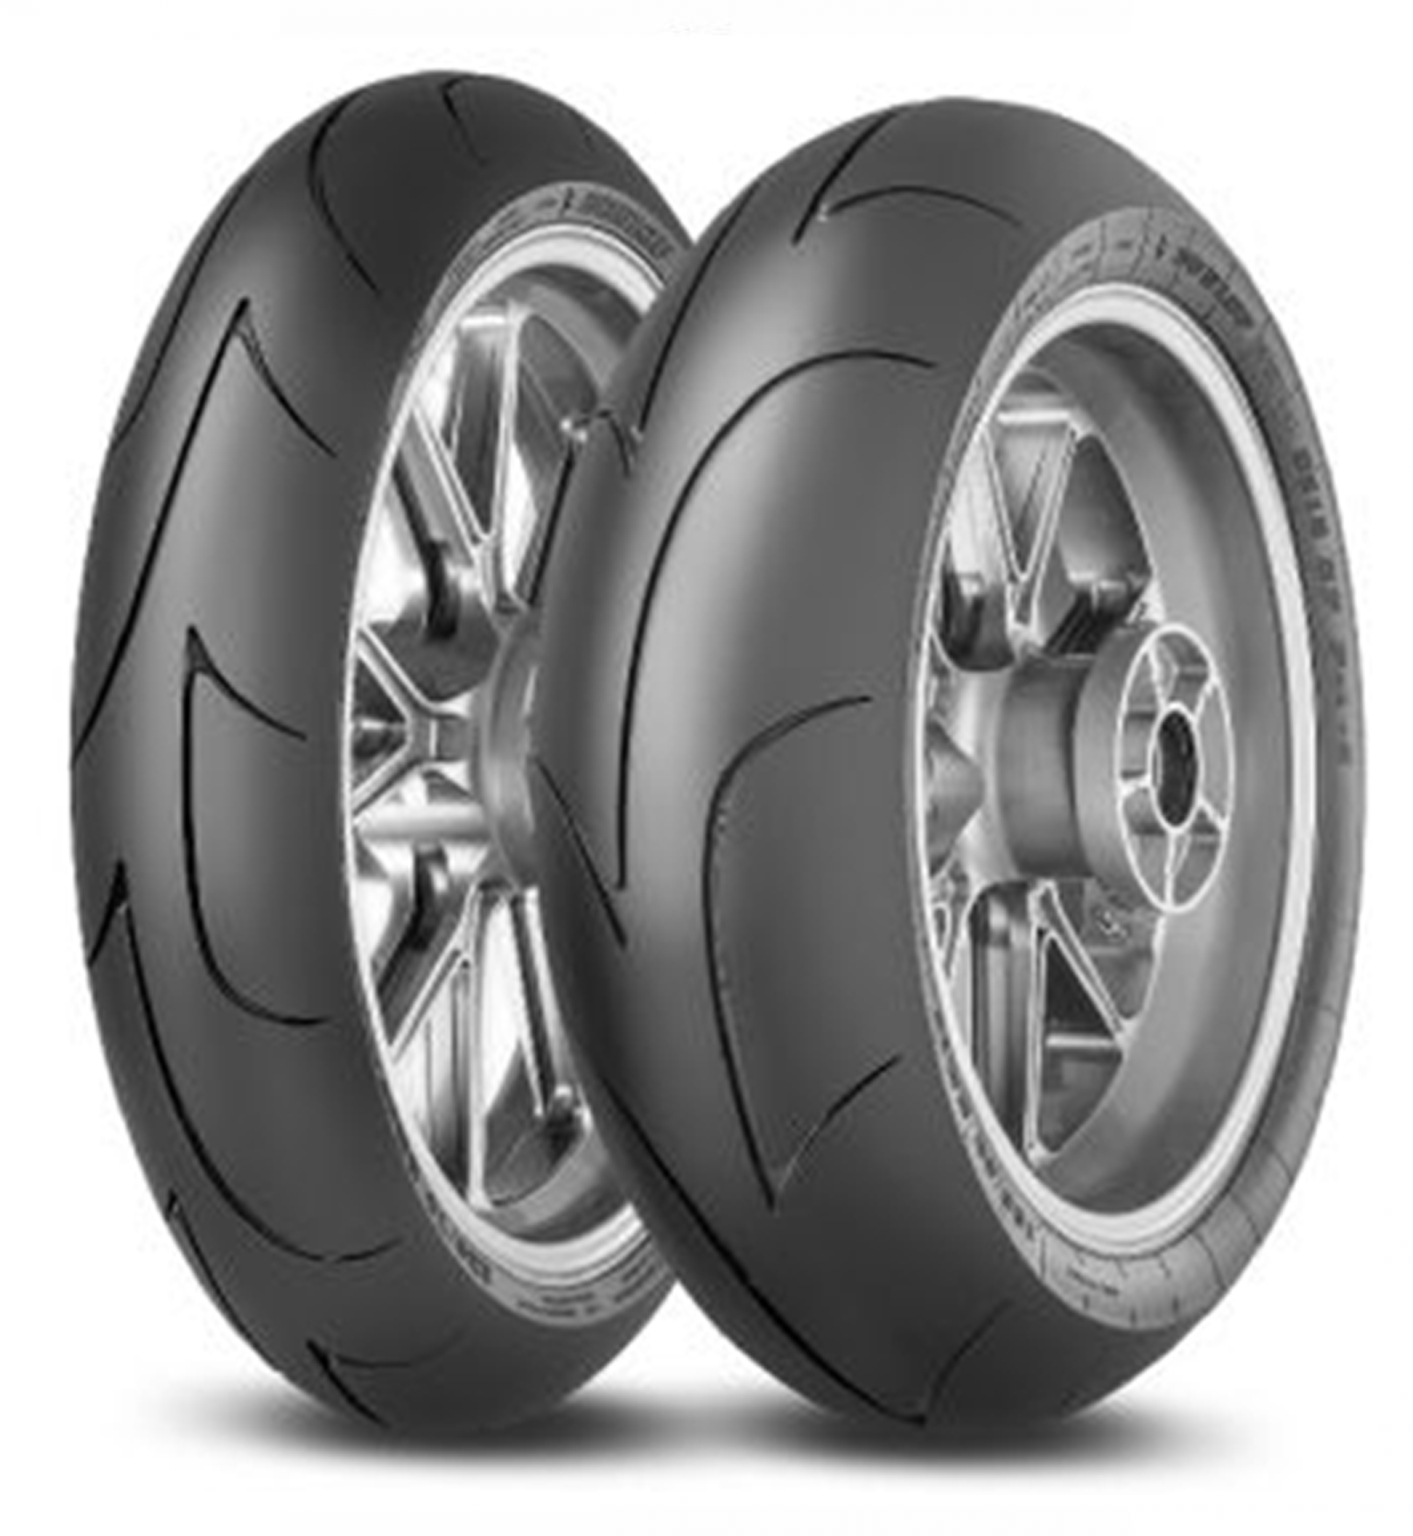 Pneumatico Dunlop GP PRO D213 200/60 17 80W TL ms0